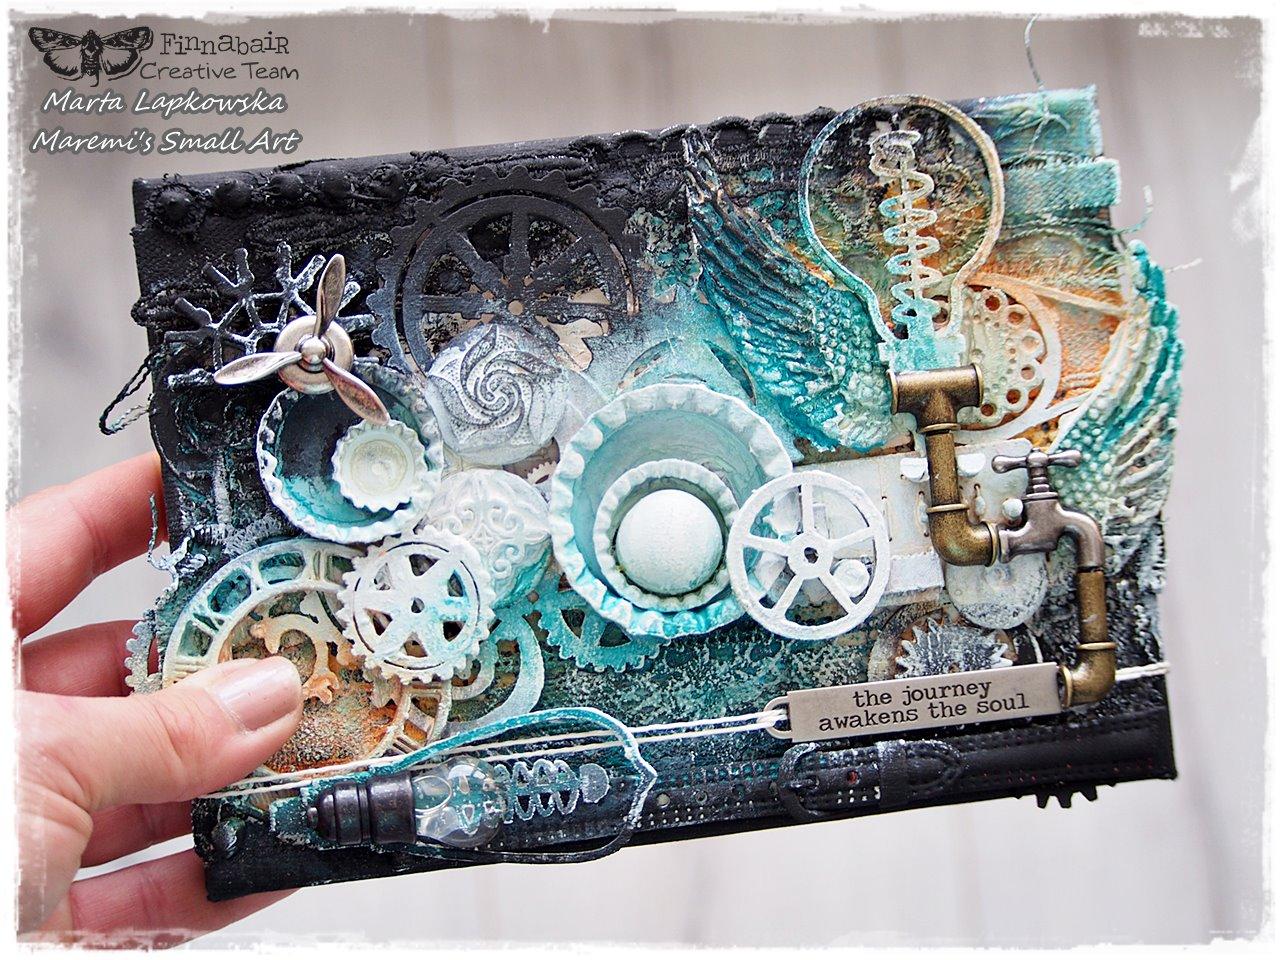 Finnabair: 'The journey...' Mini canvas by Marta Lapkowska